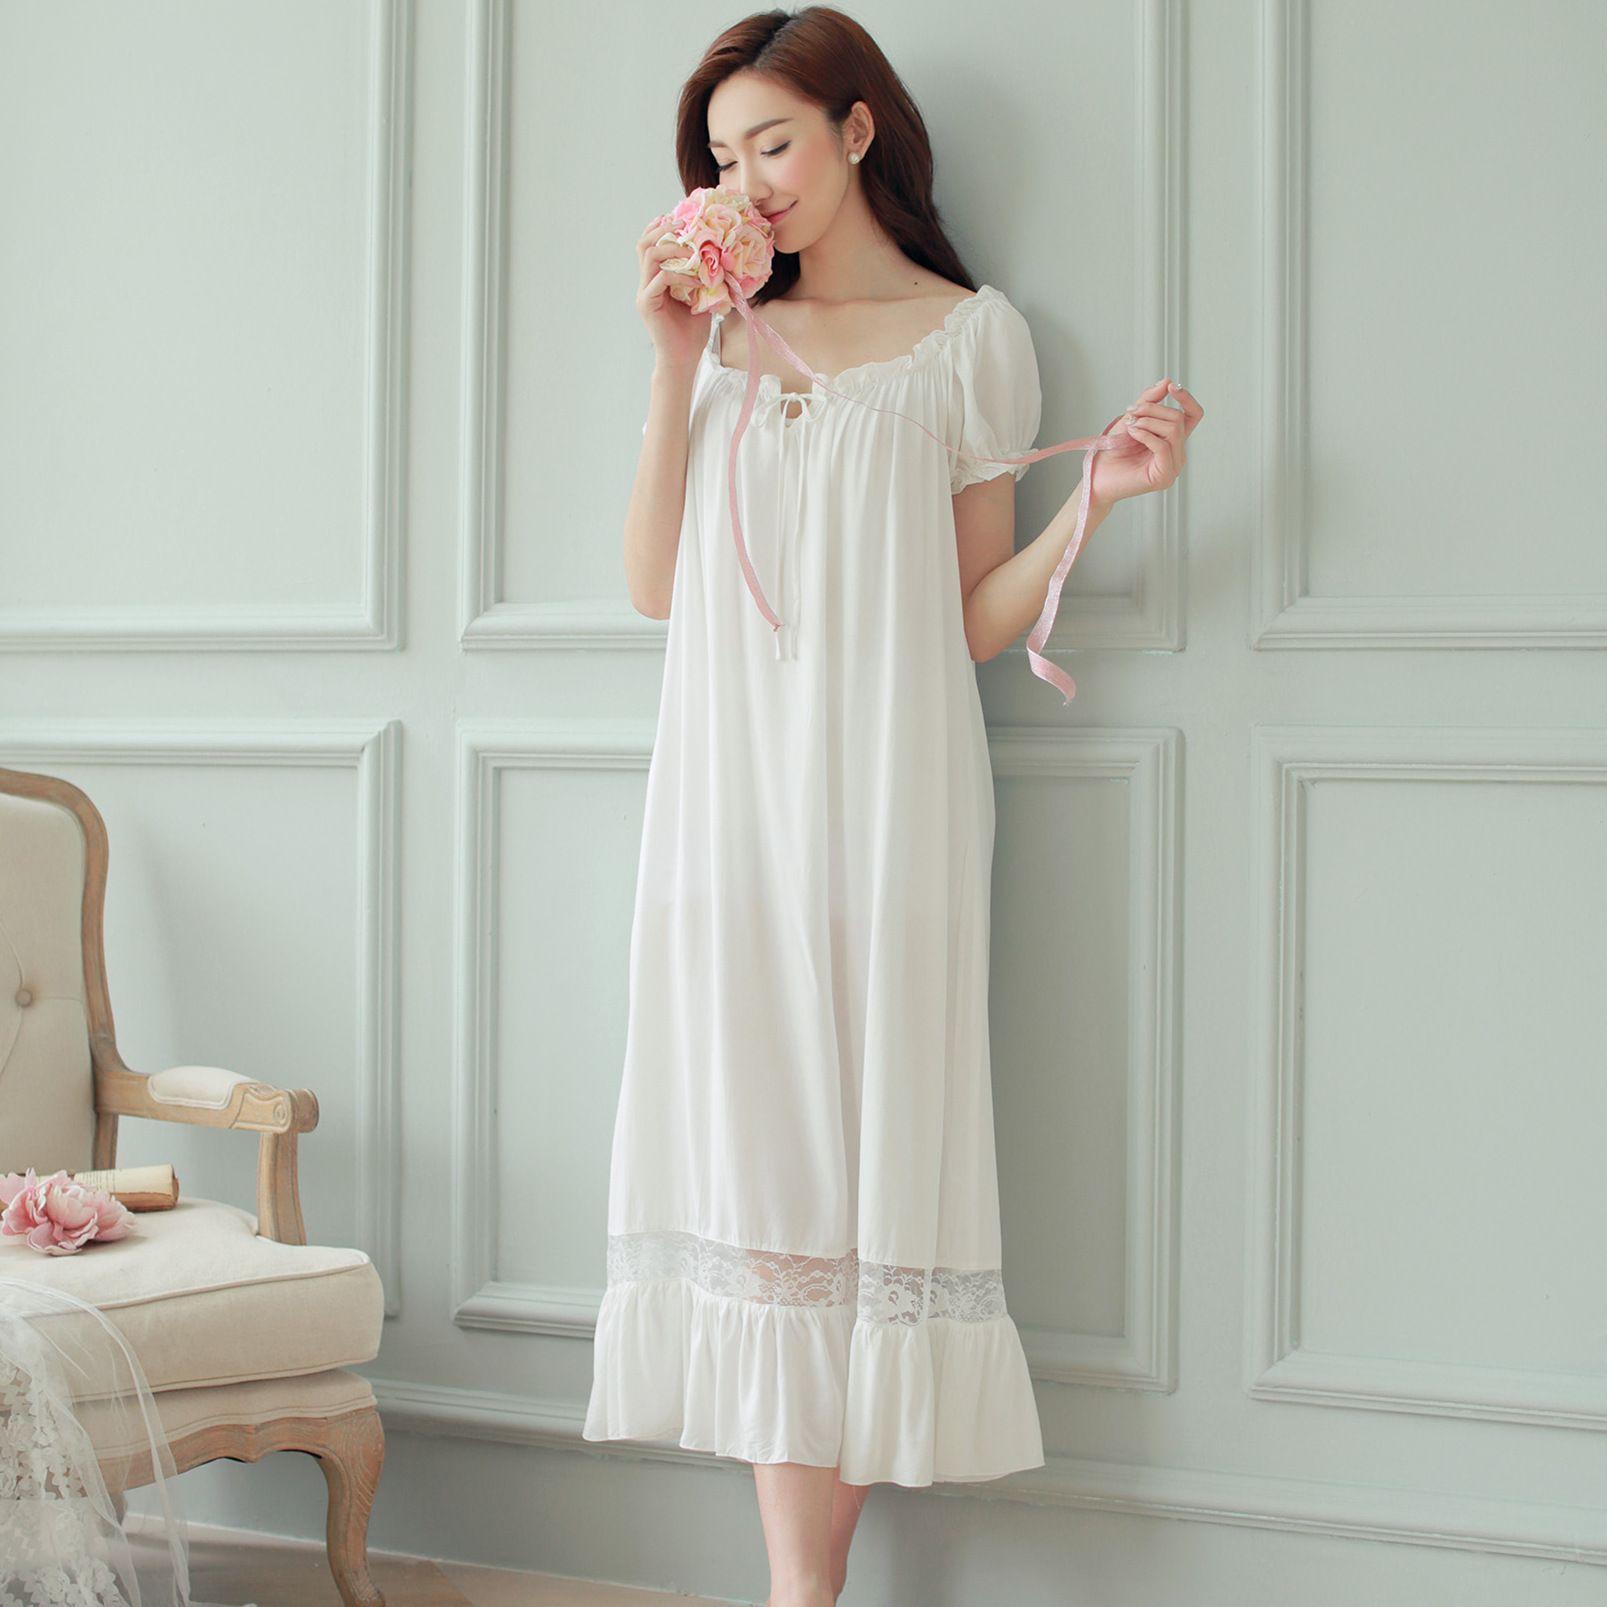 Hot Womens Long Sleeping Dress White Nightgown Short ...